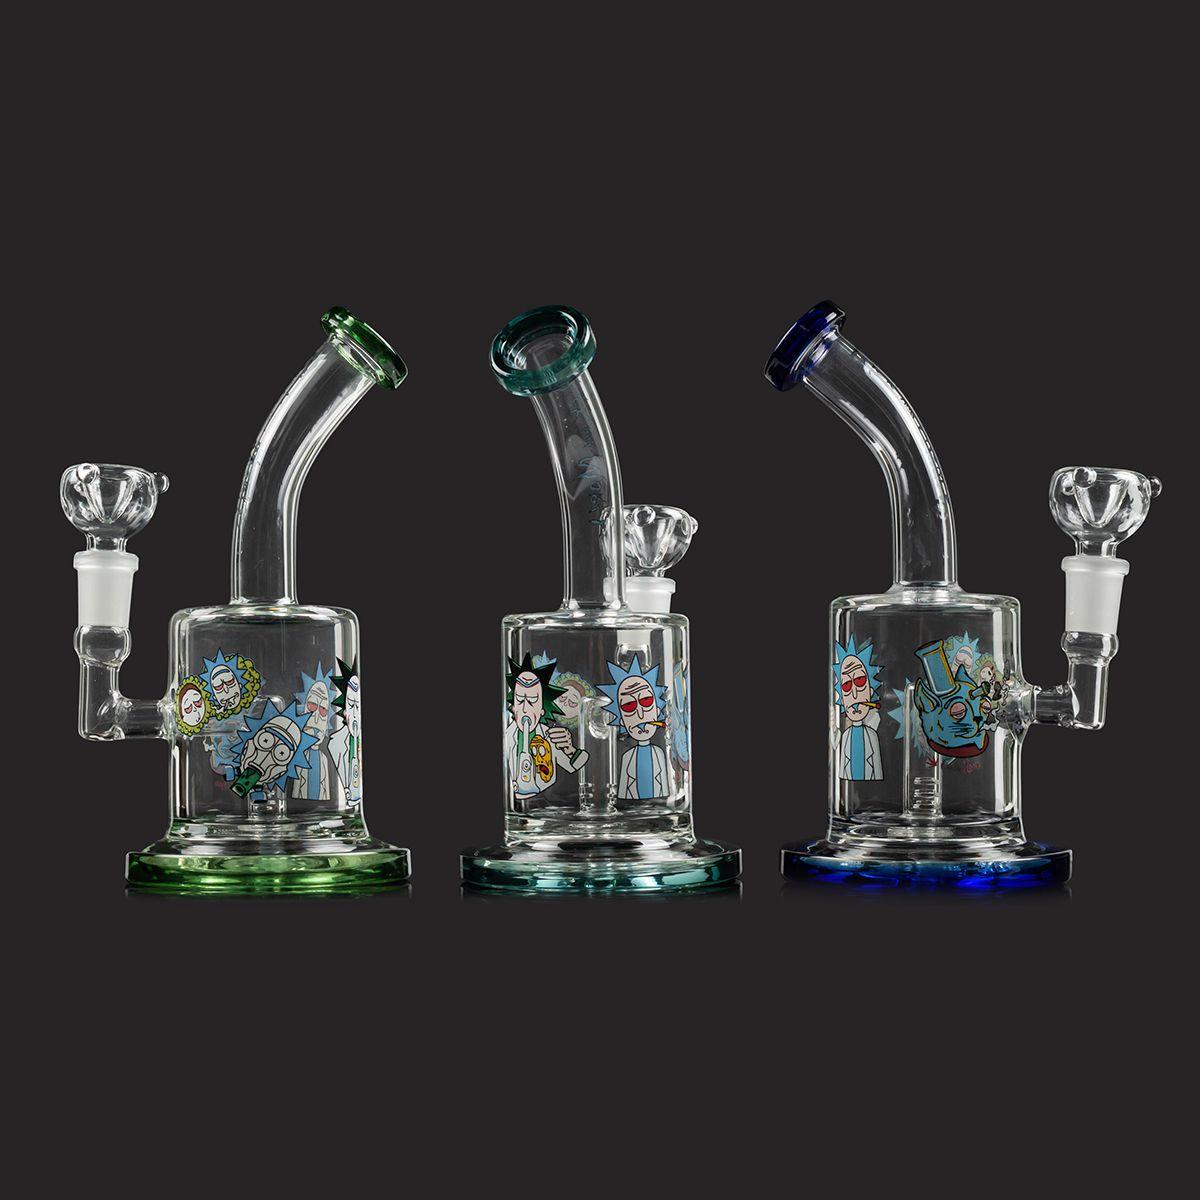 Mejor tubería de reciclado del vidrio del cubilete Bong Bong Embriagador mini-Dab Rigs Agua aceite espeso Plataformas cera de fumar pipa de agua de 14 mm de tuberías Tazón pelele